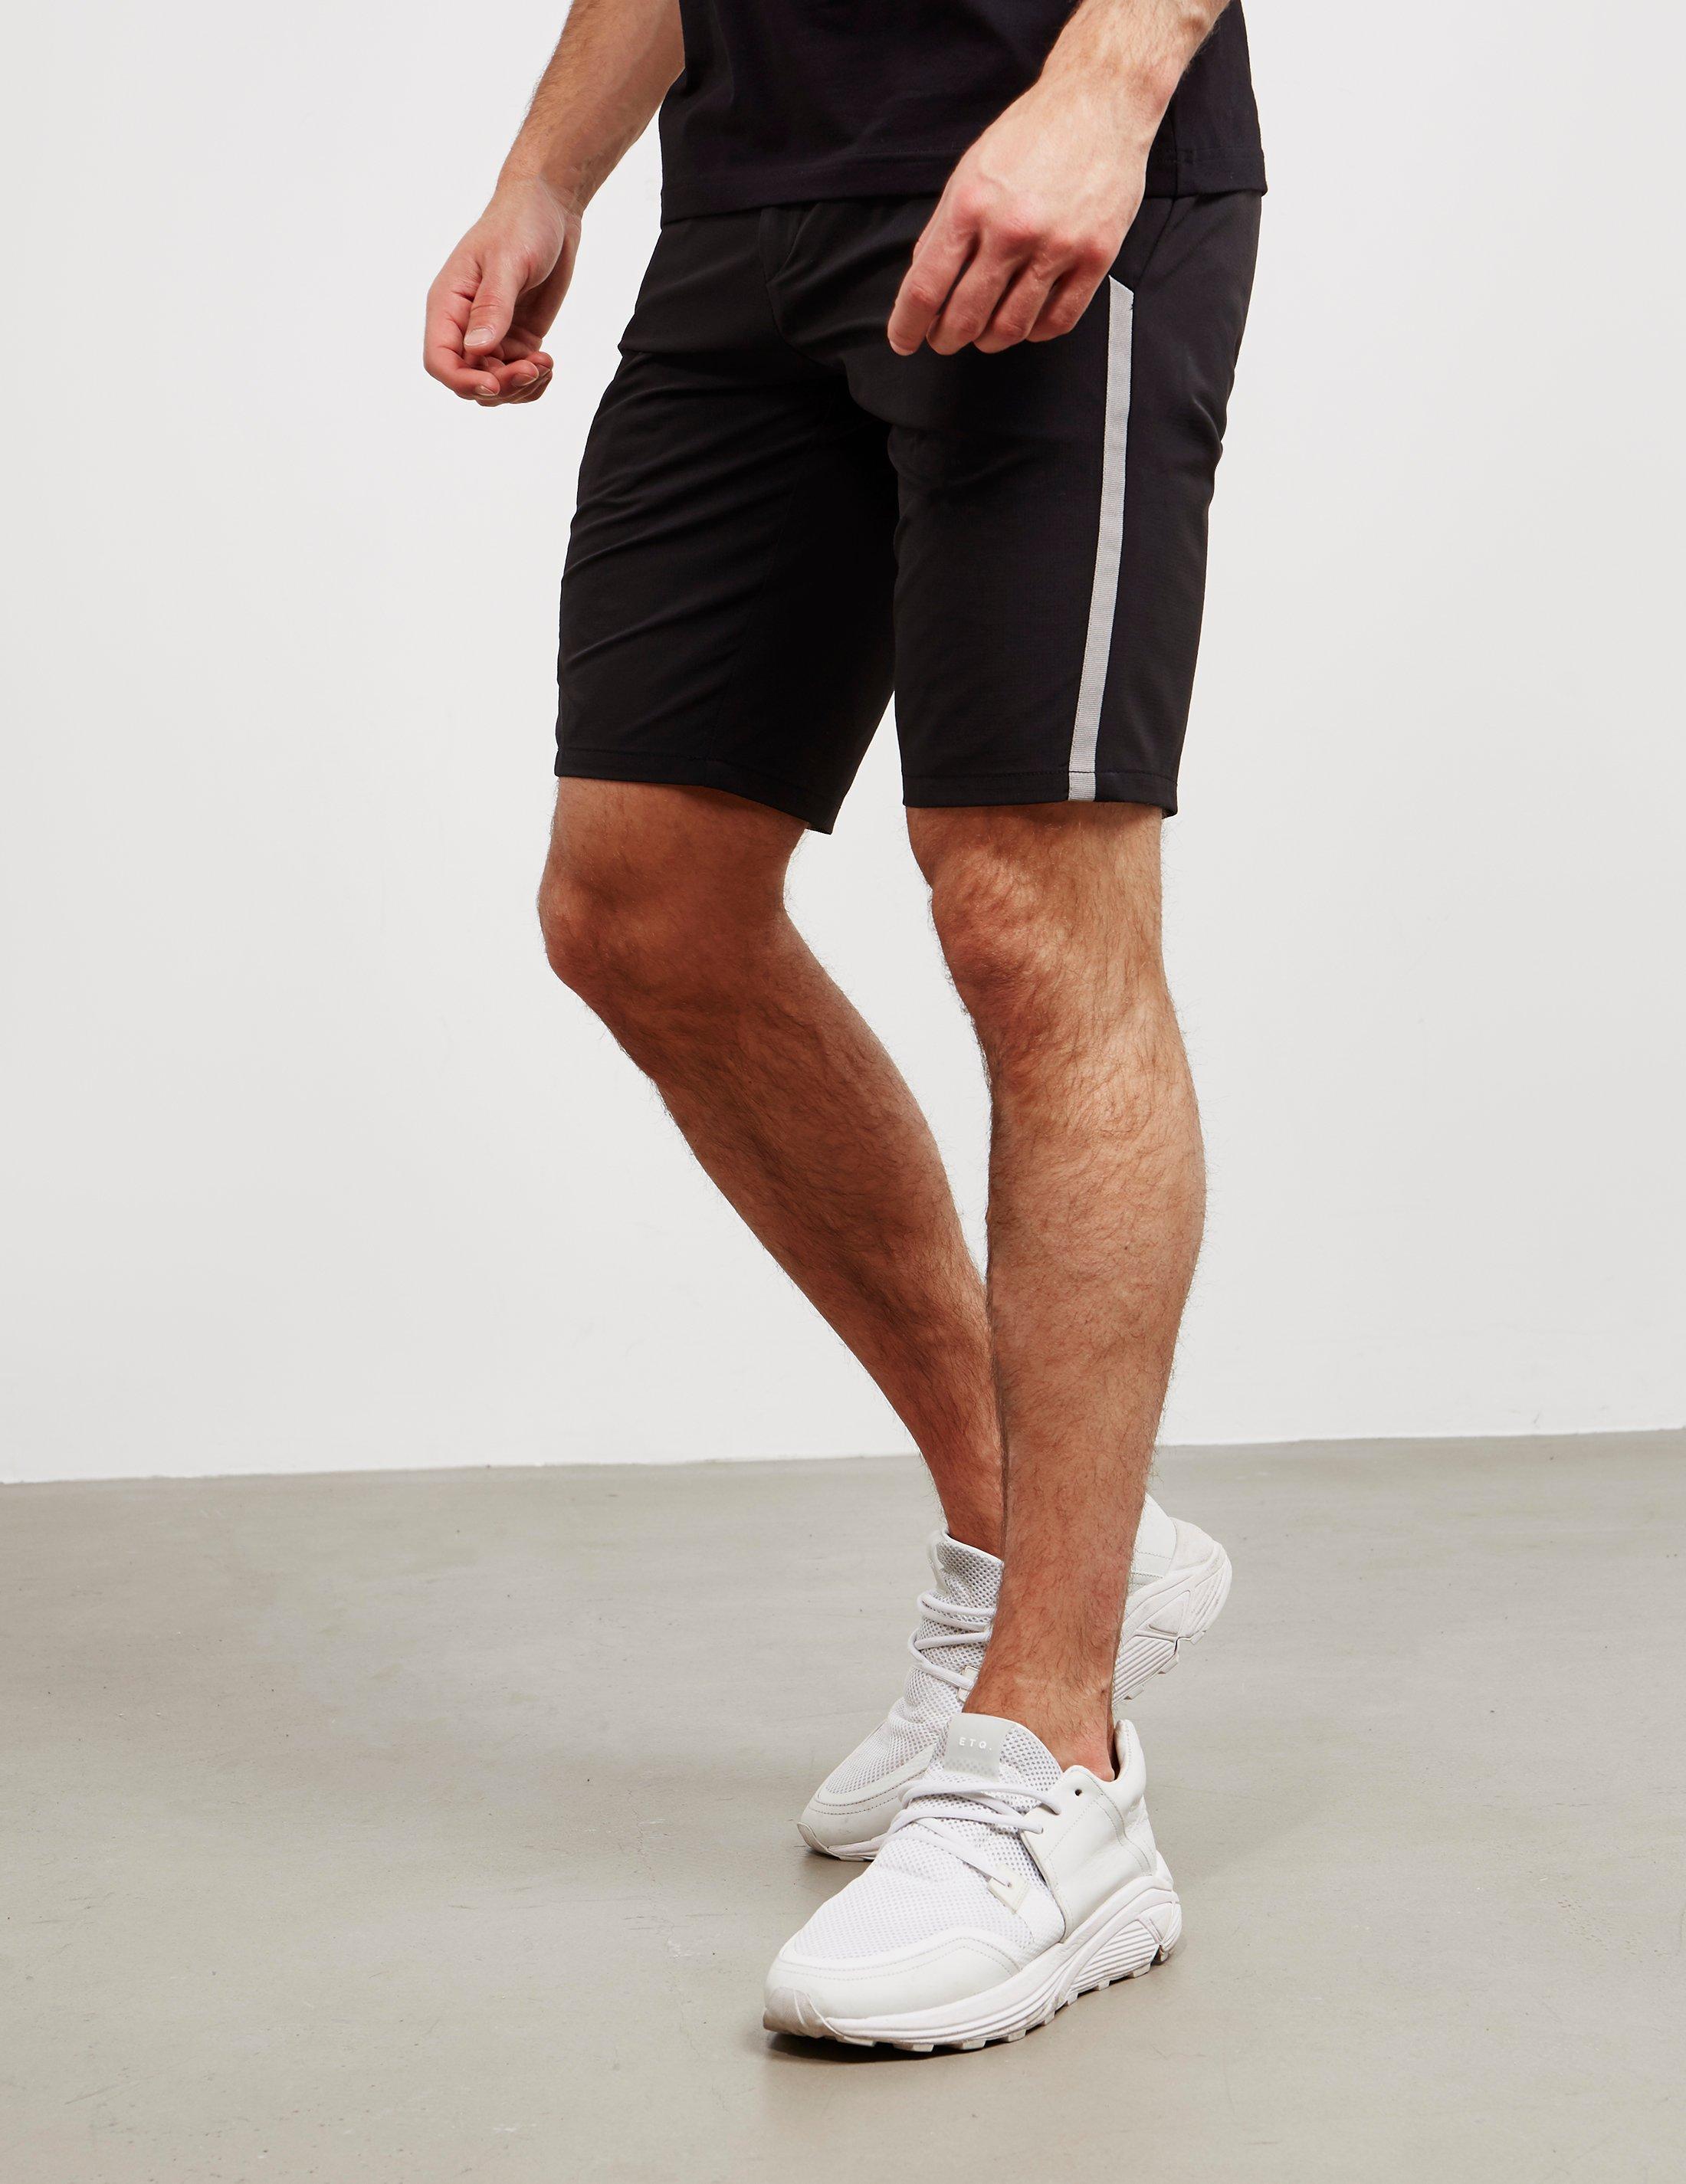 8d20be9eb BOSS Mens Hapros Shorts Black in Black for Men - Lyst